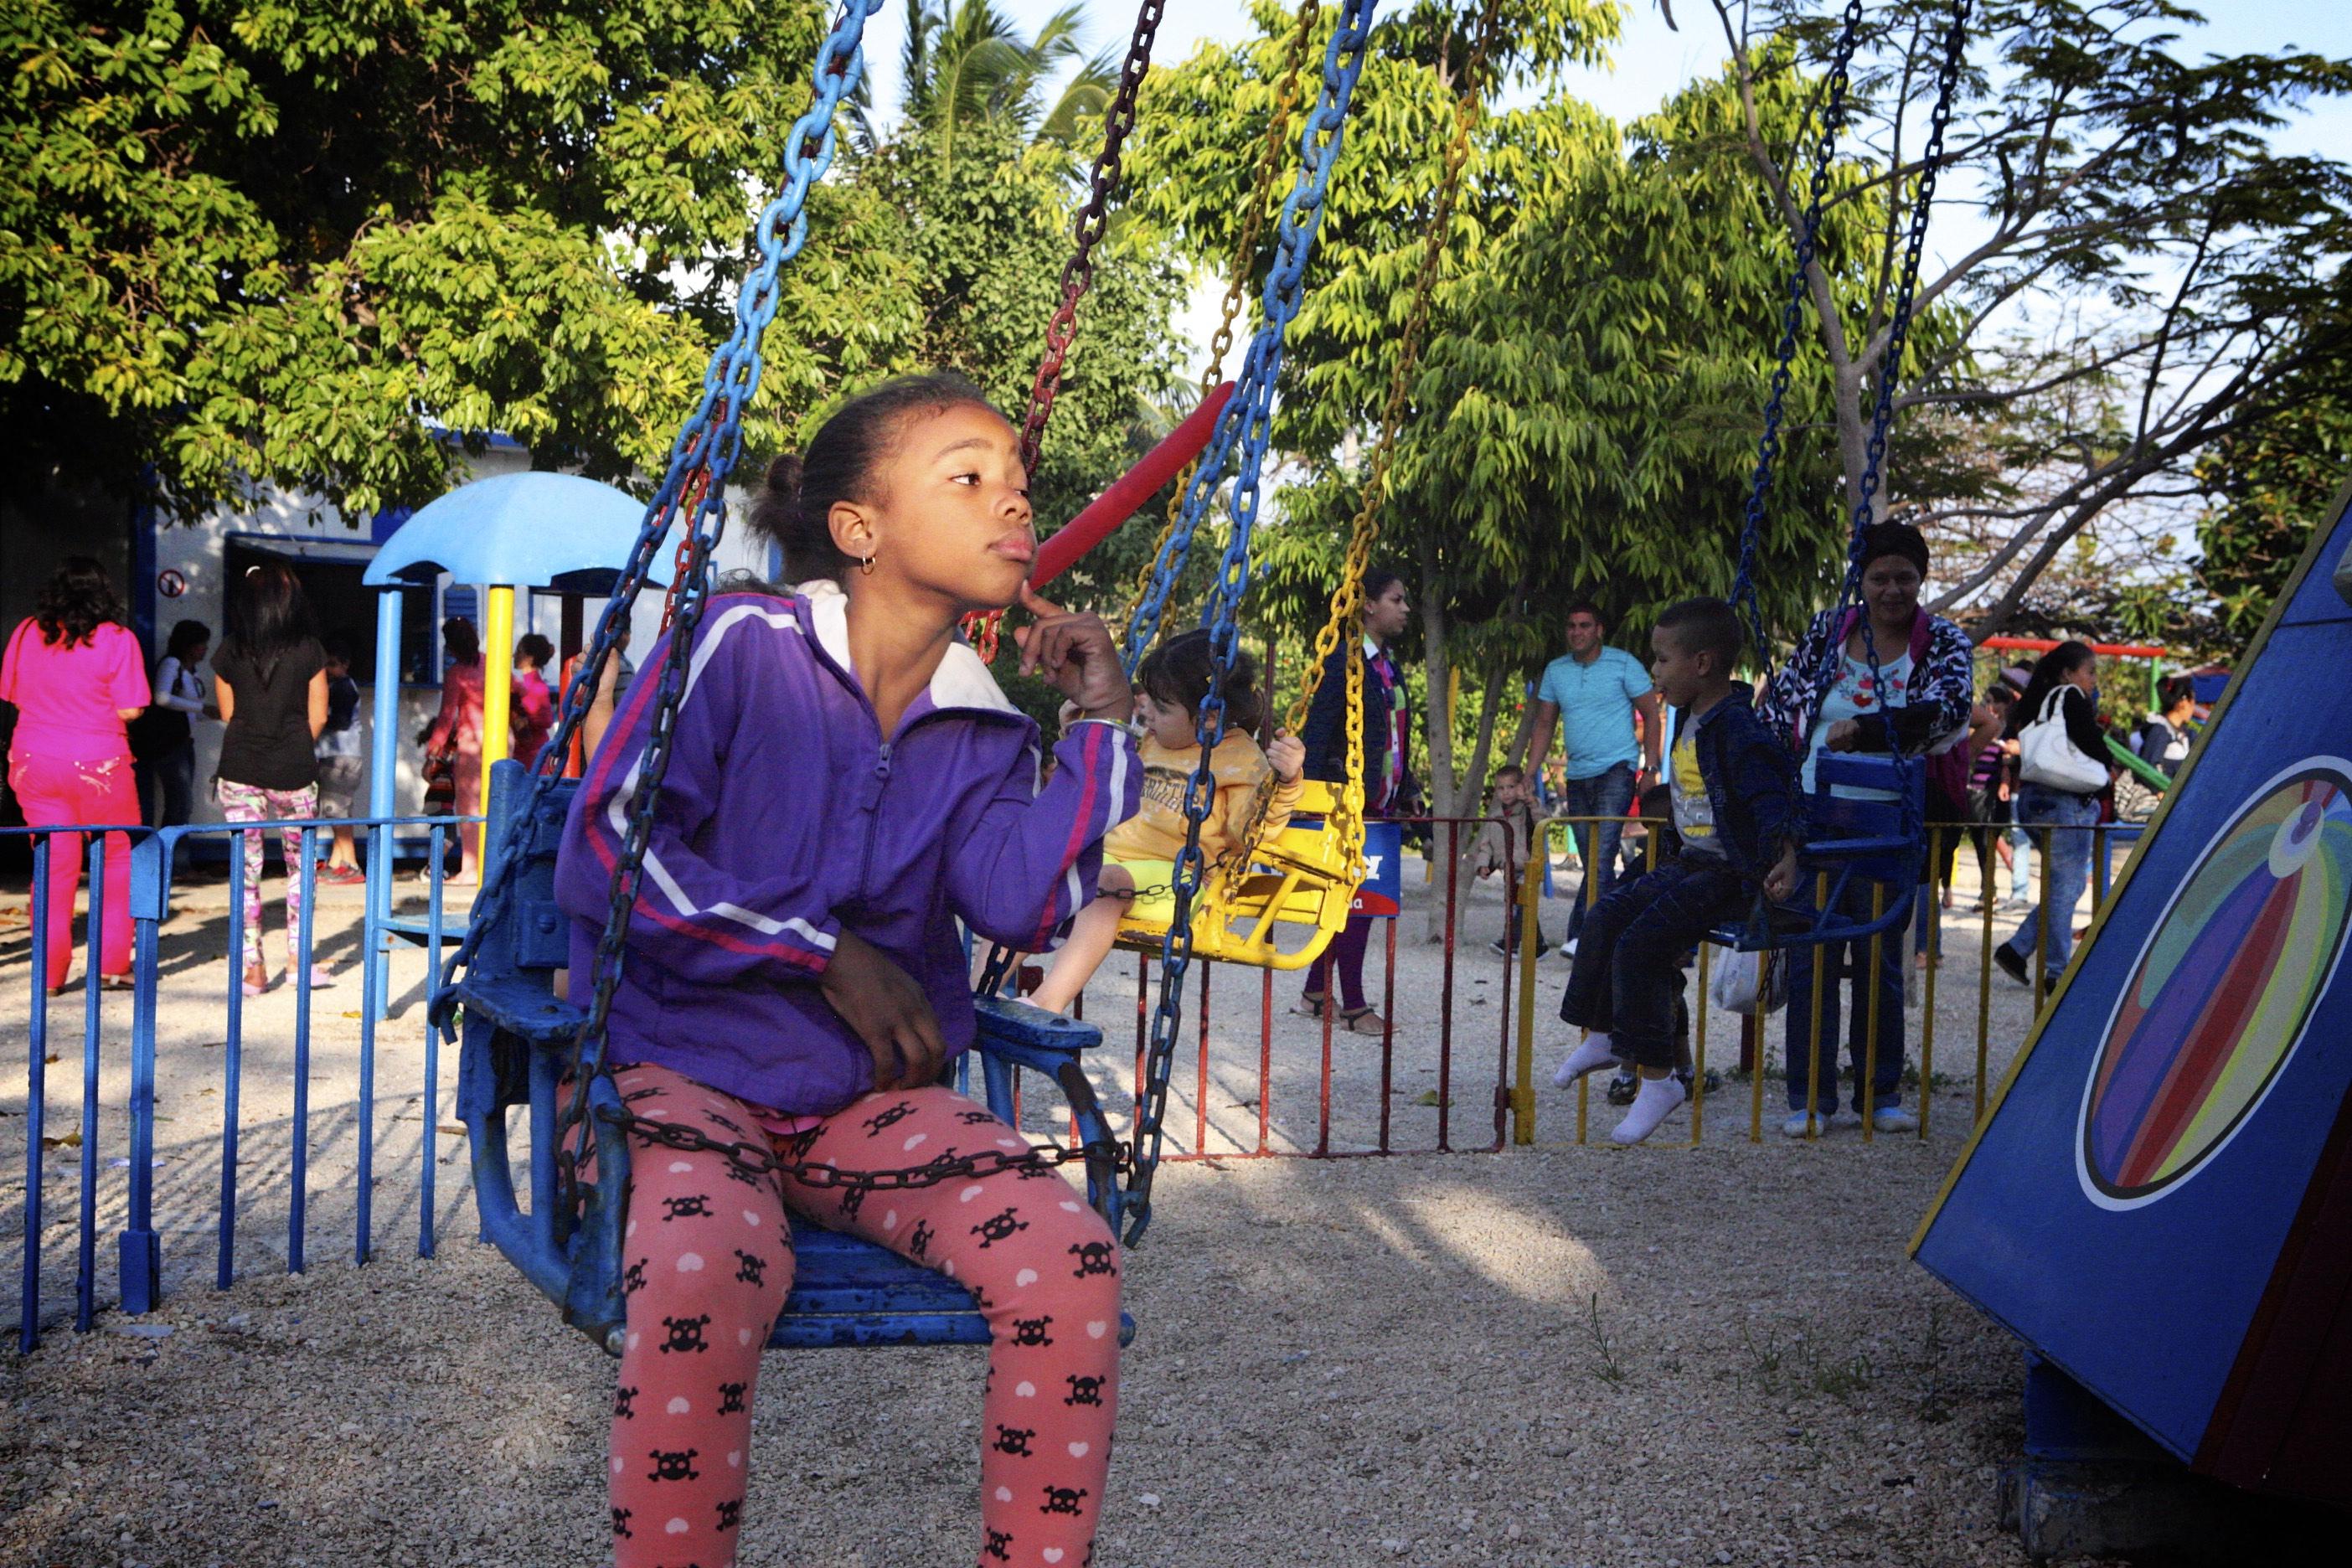 Chair Ride: Parque Maestranza